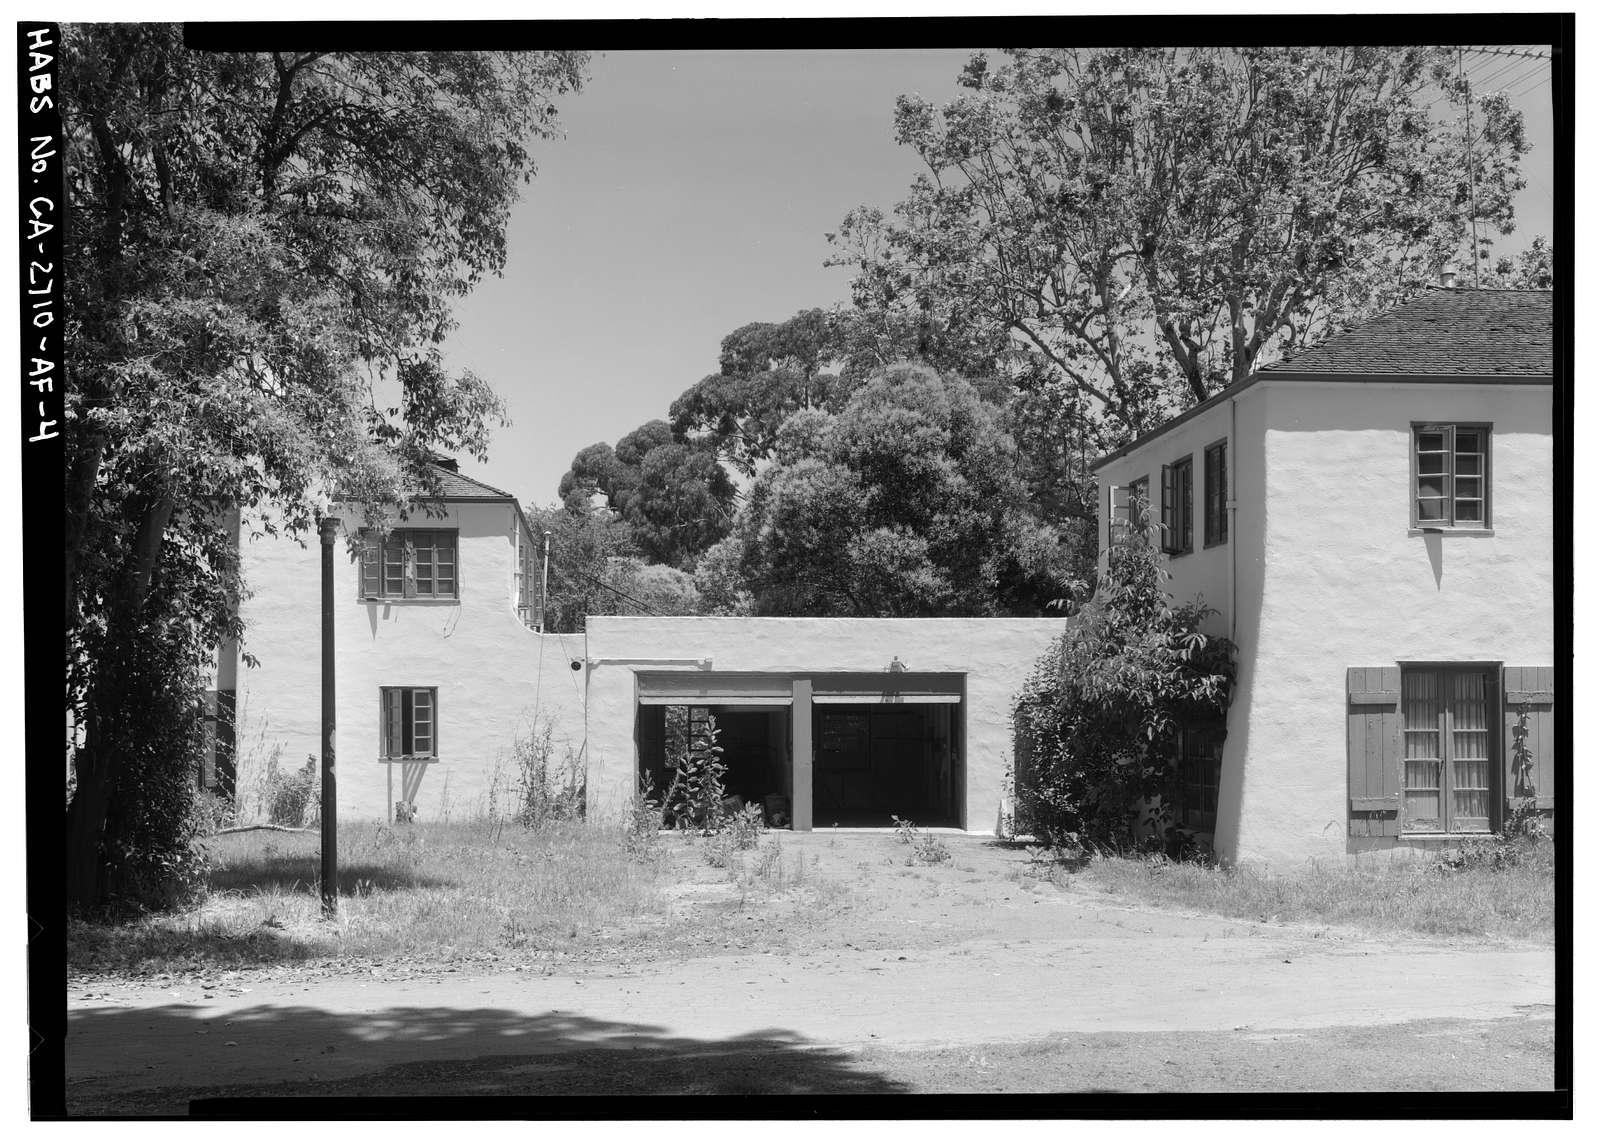 Agnews State Hospital, Physician's Cottage No. 5, South Side of Palm Drive, Santa Clara, Santa Clara County, CA